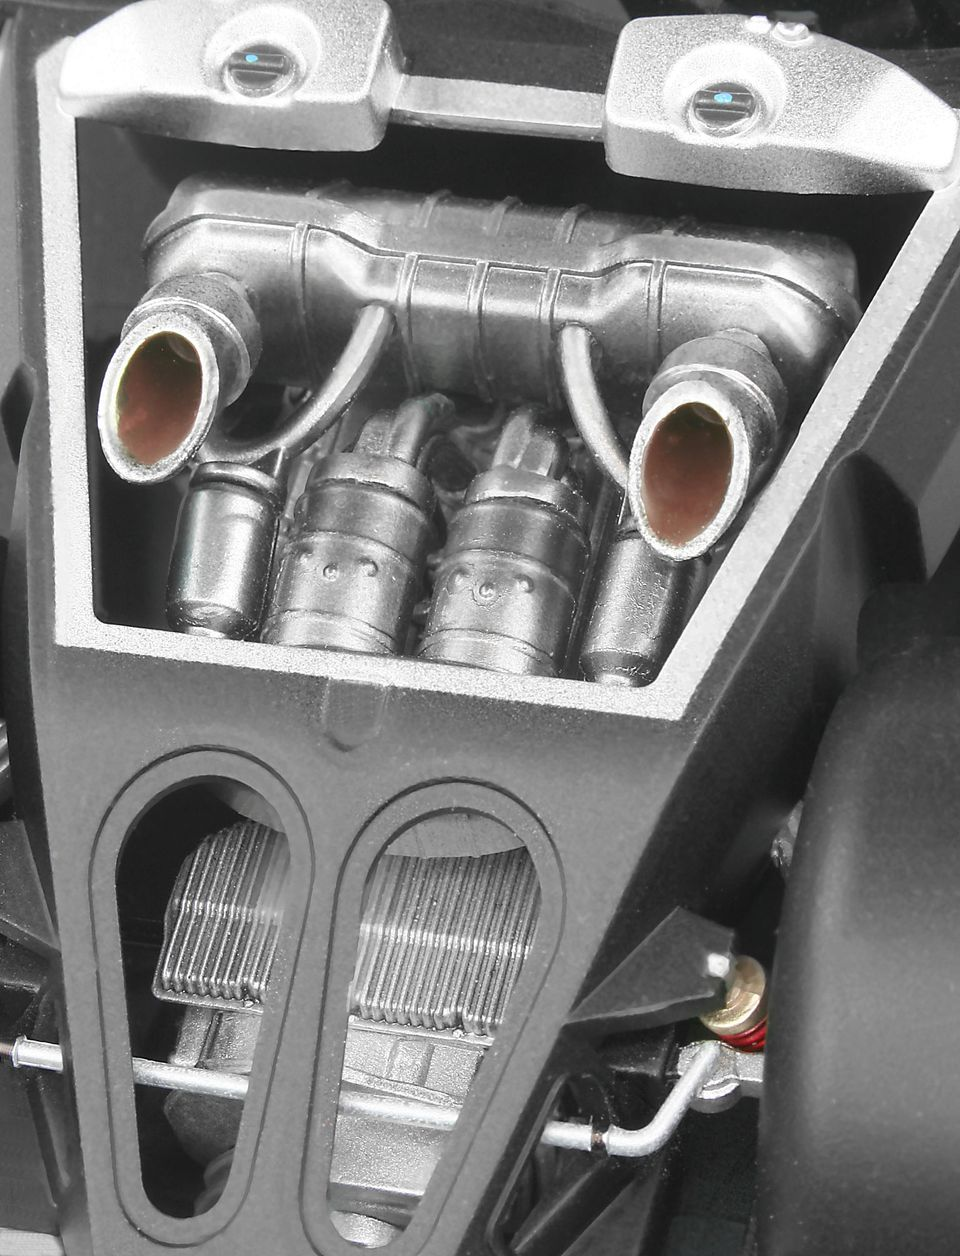 Porsche 918 Spyder Revell Modelisme Www Fxmodelrc Com